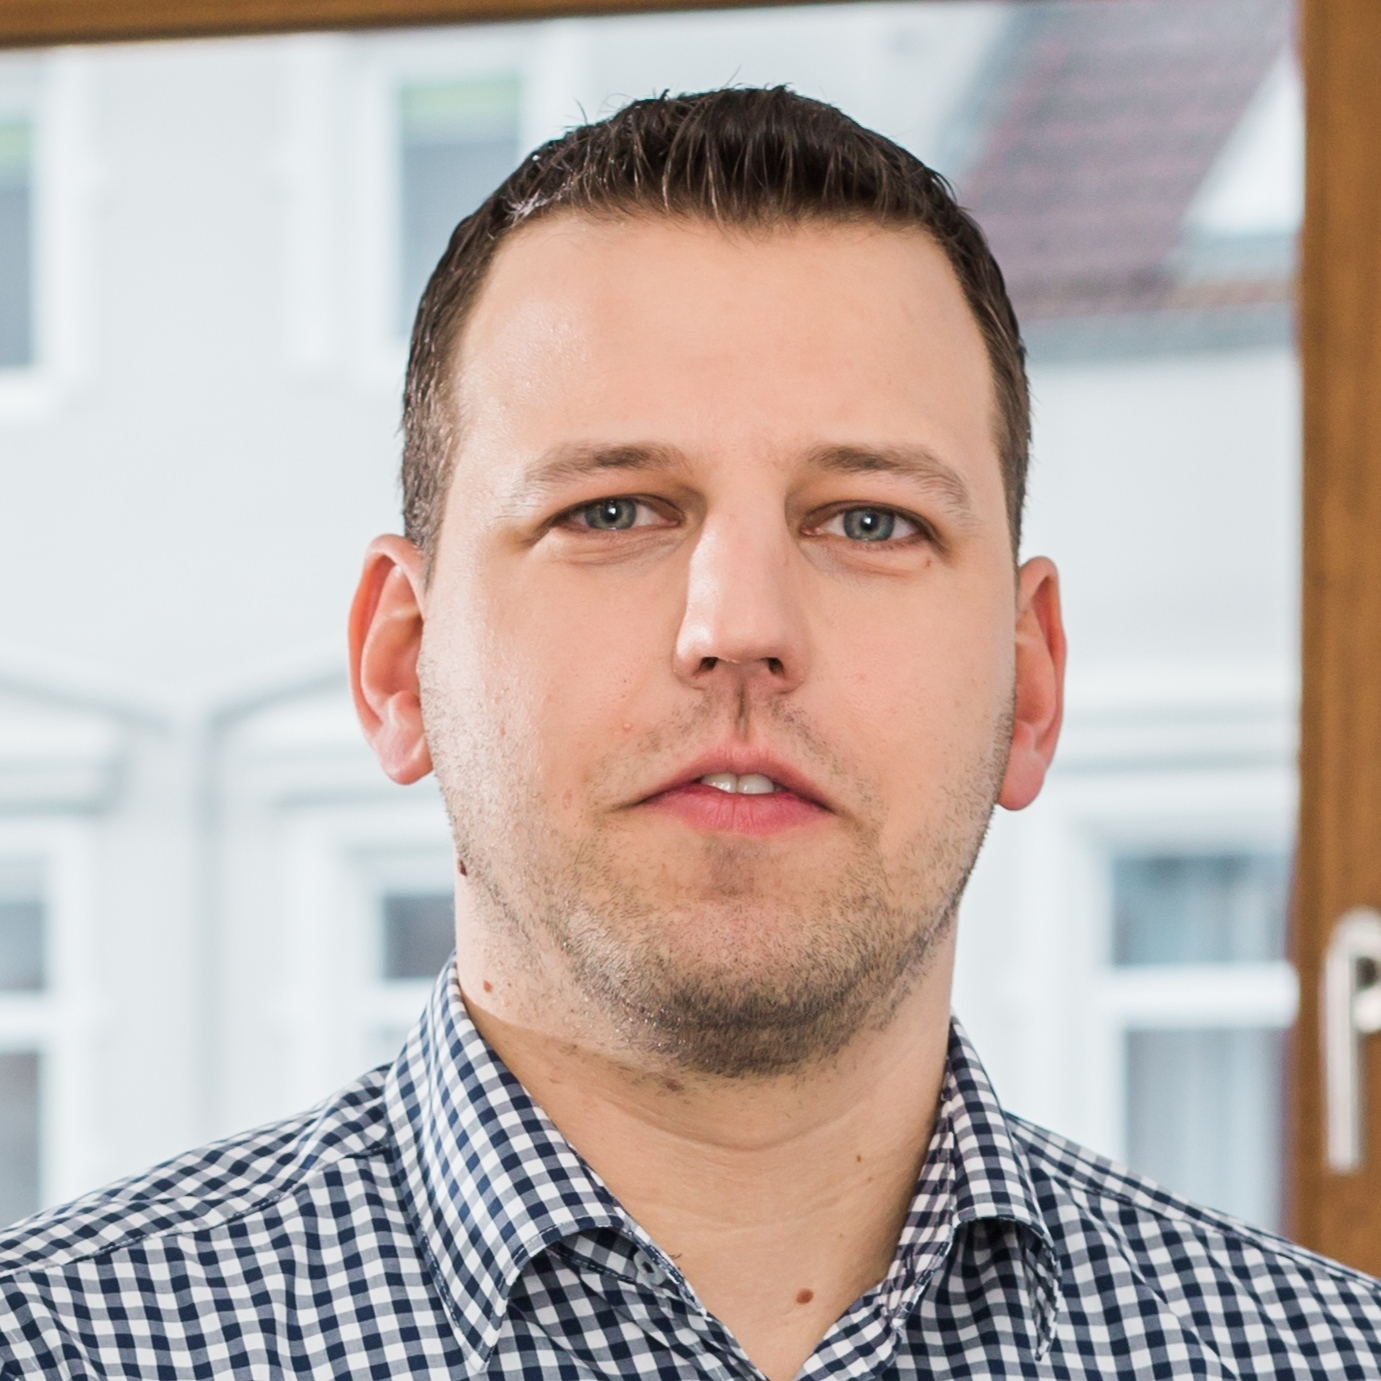 Tim-Oliver Rieck